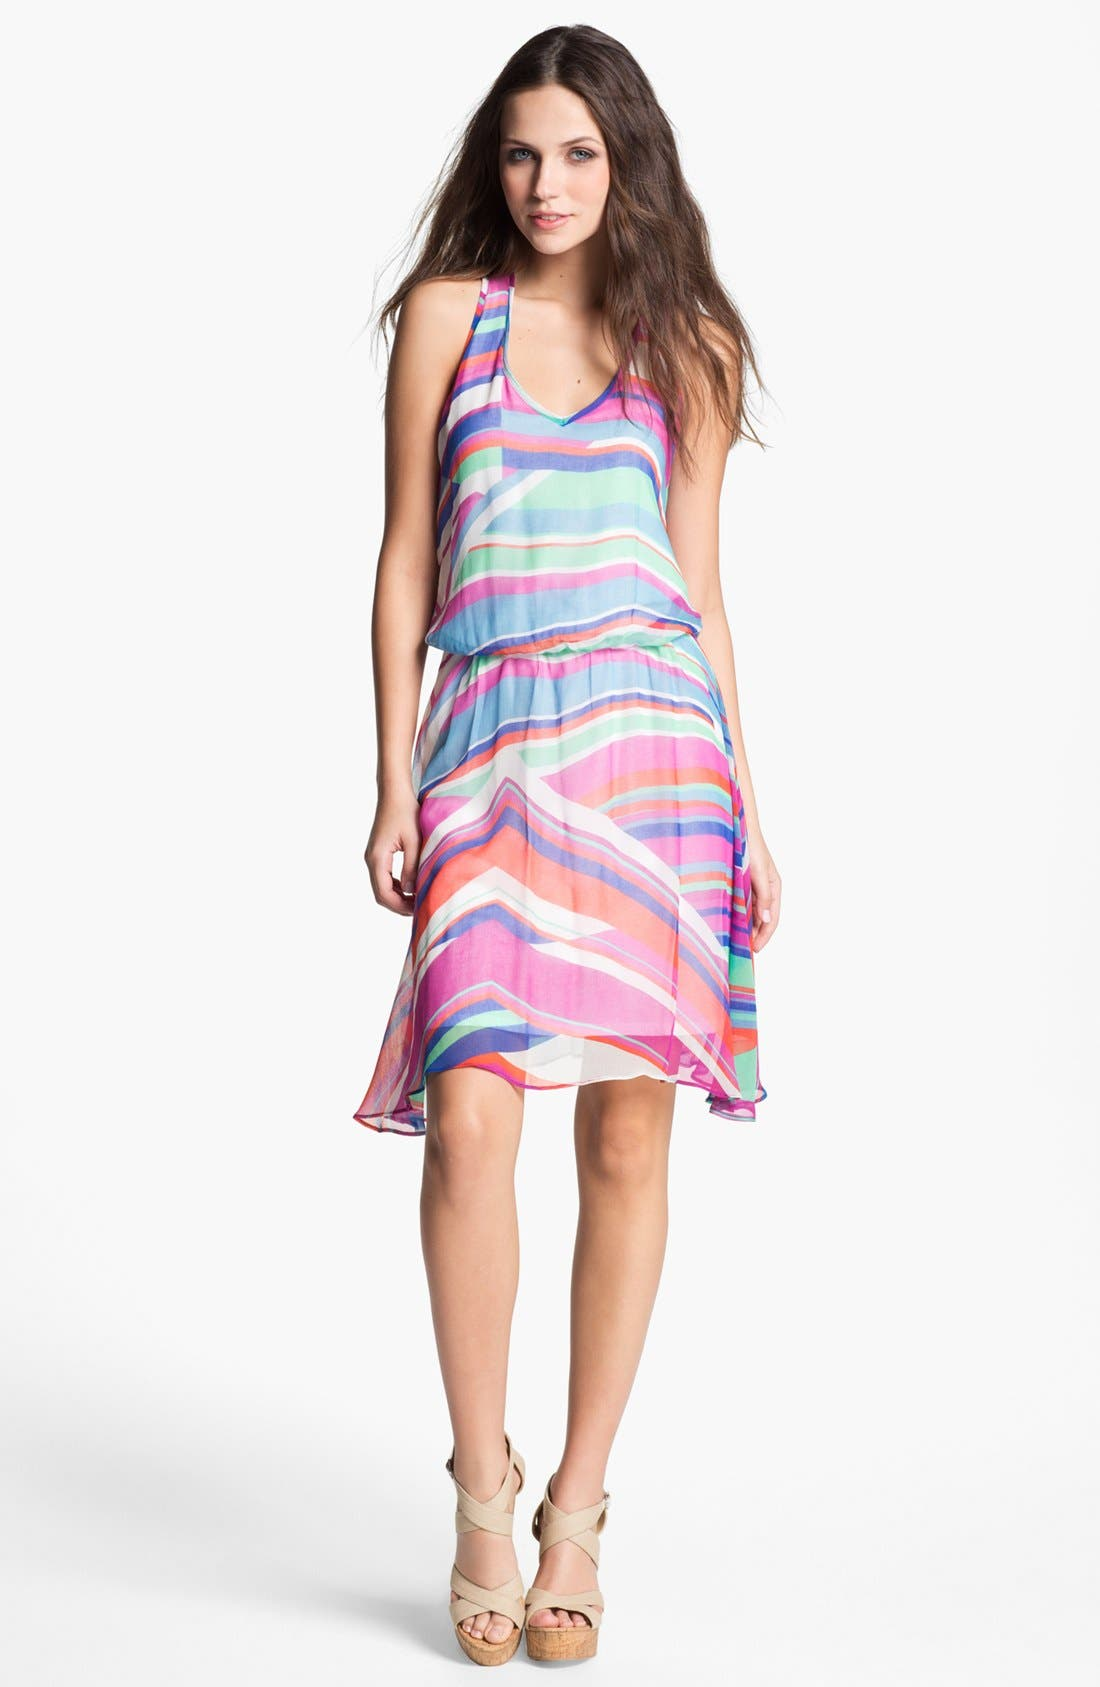 Alternate Image 1 Selected - Ella Moss Print Chiffon Tank Dress